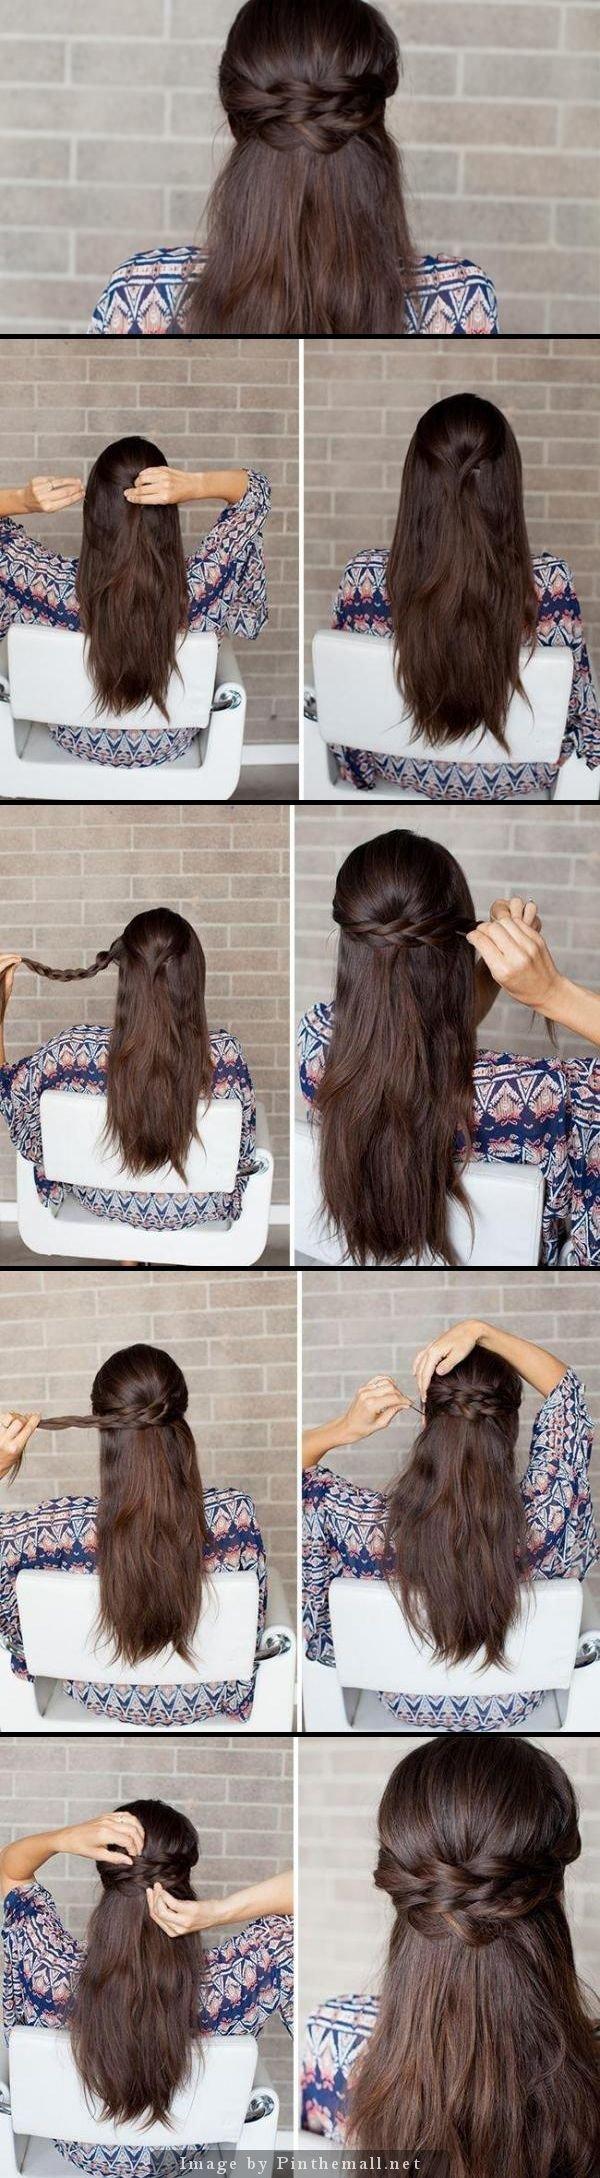 hair,brown,fur,hairstyle,art,